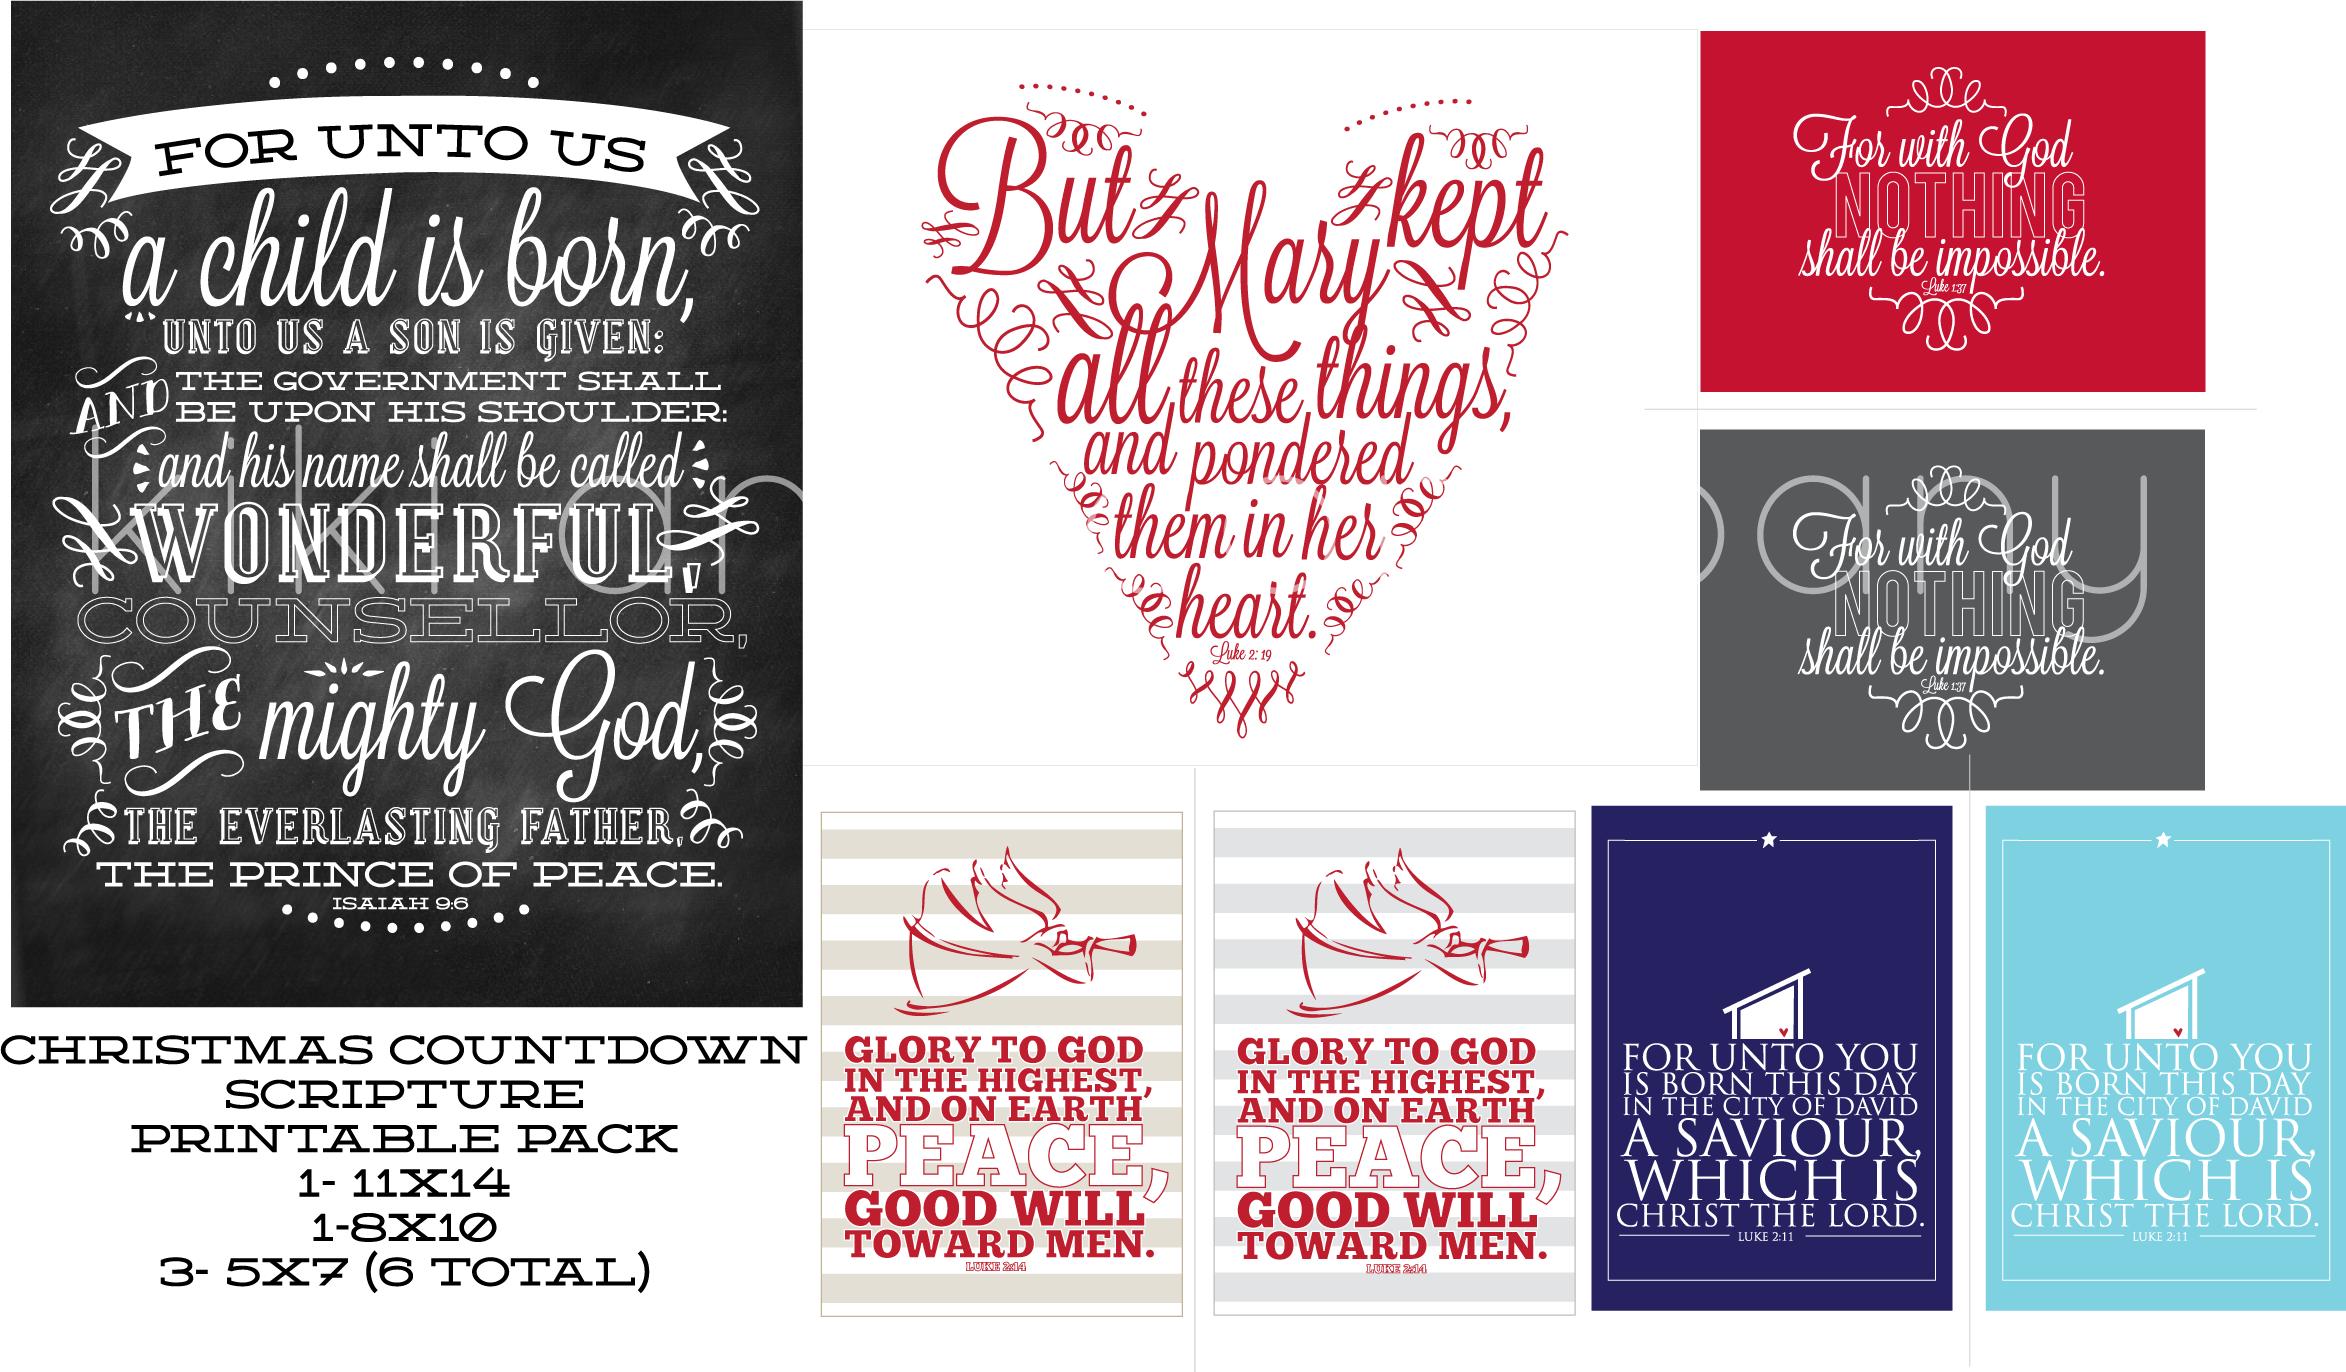 Christmas Countdown Scripture-Printables | http://kikicomin.com/wp ...